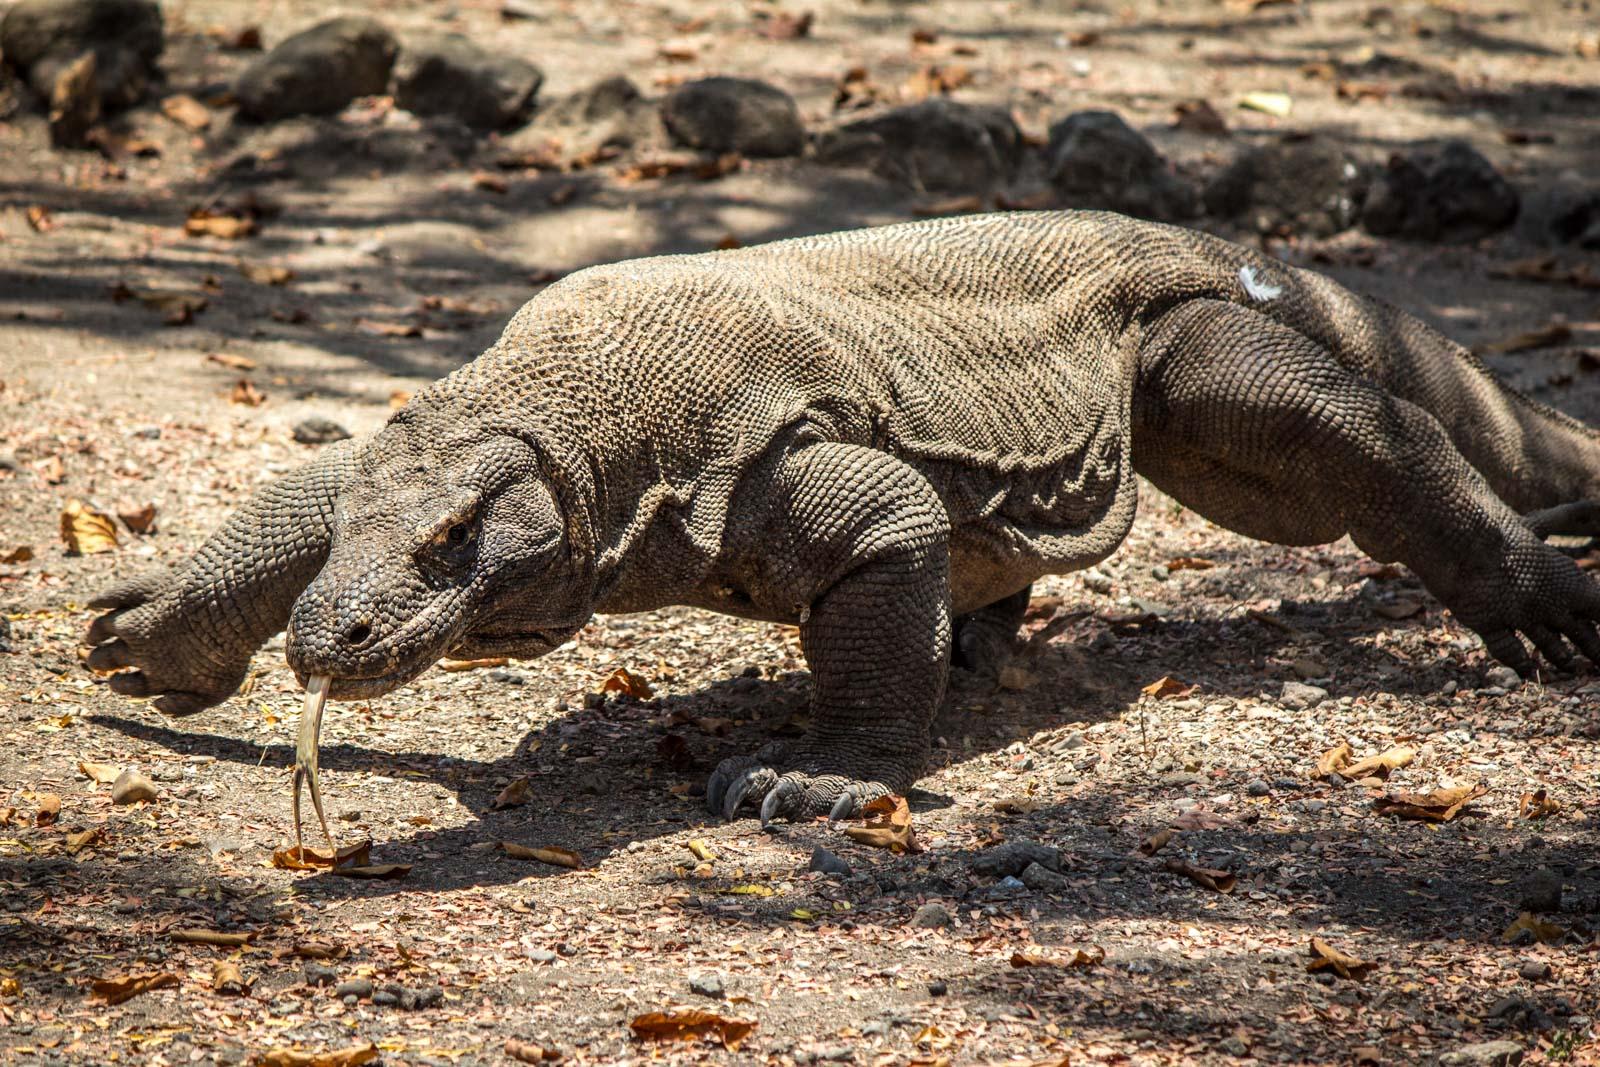 Seeing the Komodo Dragons at Komodo Island National Park, Indonesia